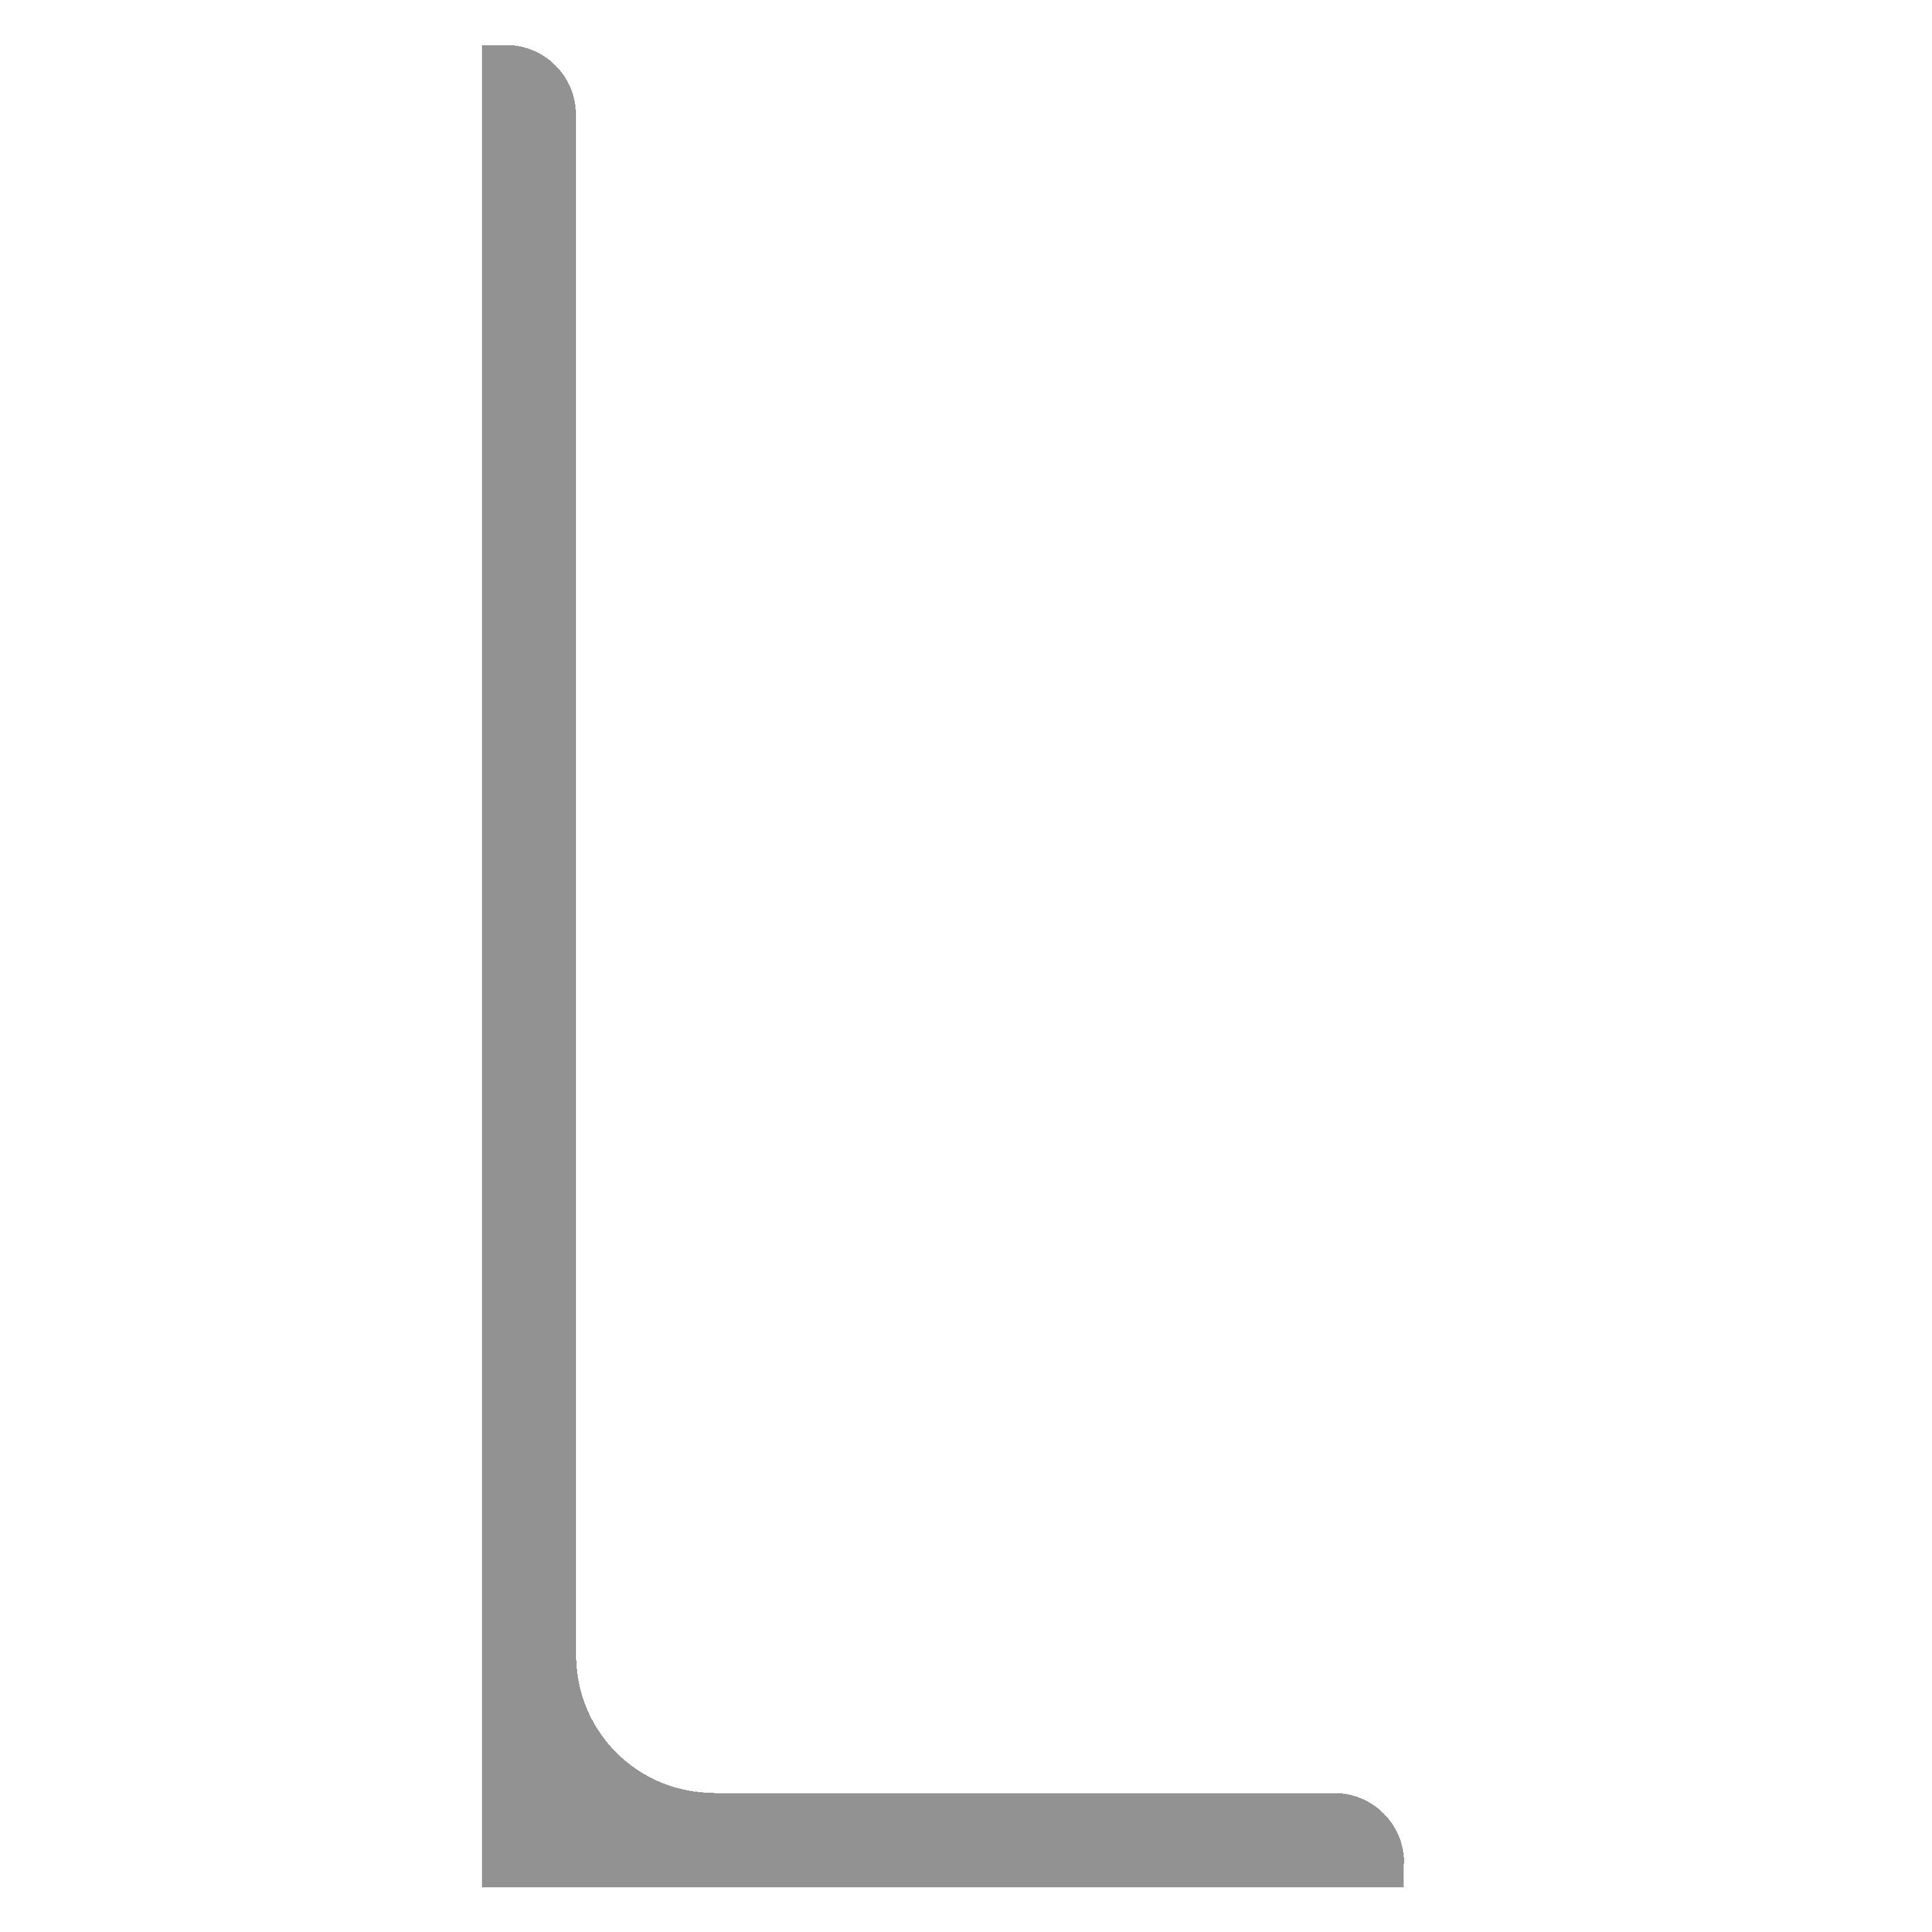 Hoeklijn thermisch verzinkt 200x100x10 mm